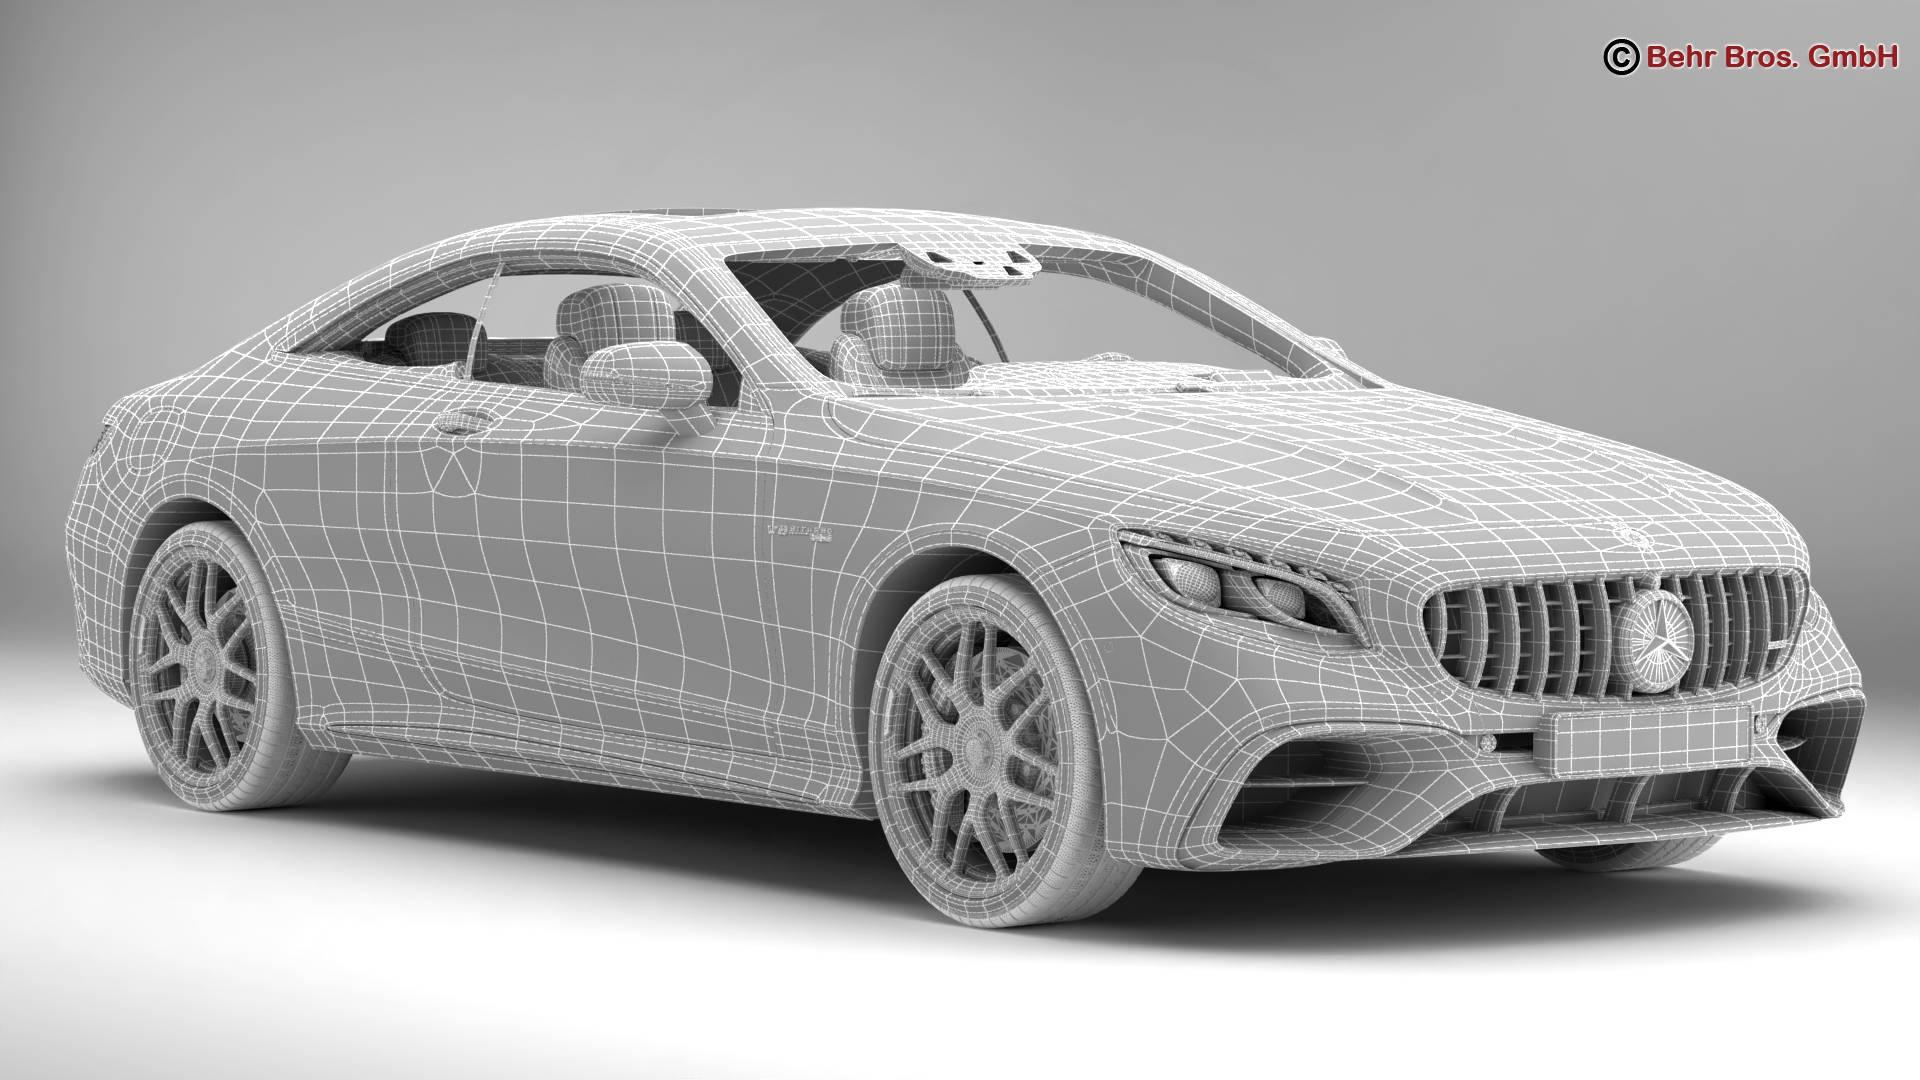 mercedes s klase kupeja s63 2018 3d modelis 3ds max fbx c4d lwo ma mb obj 274105